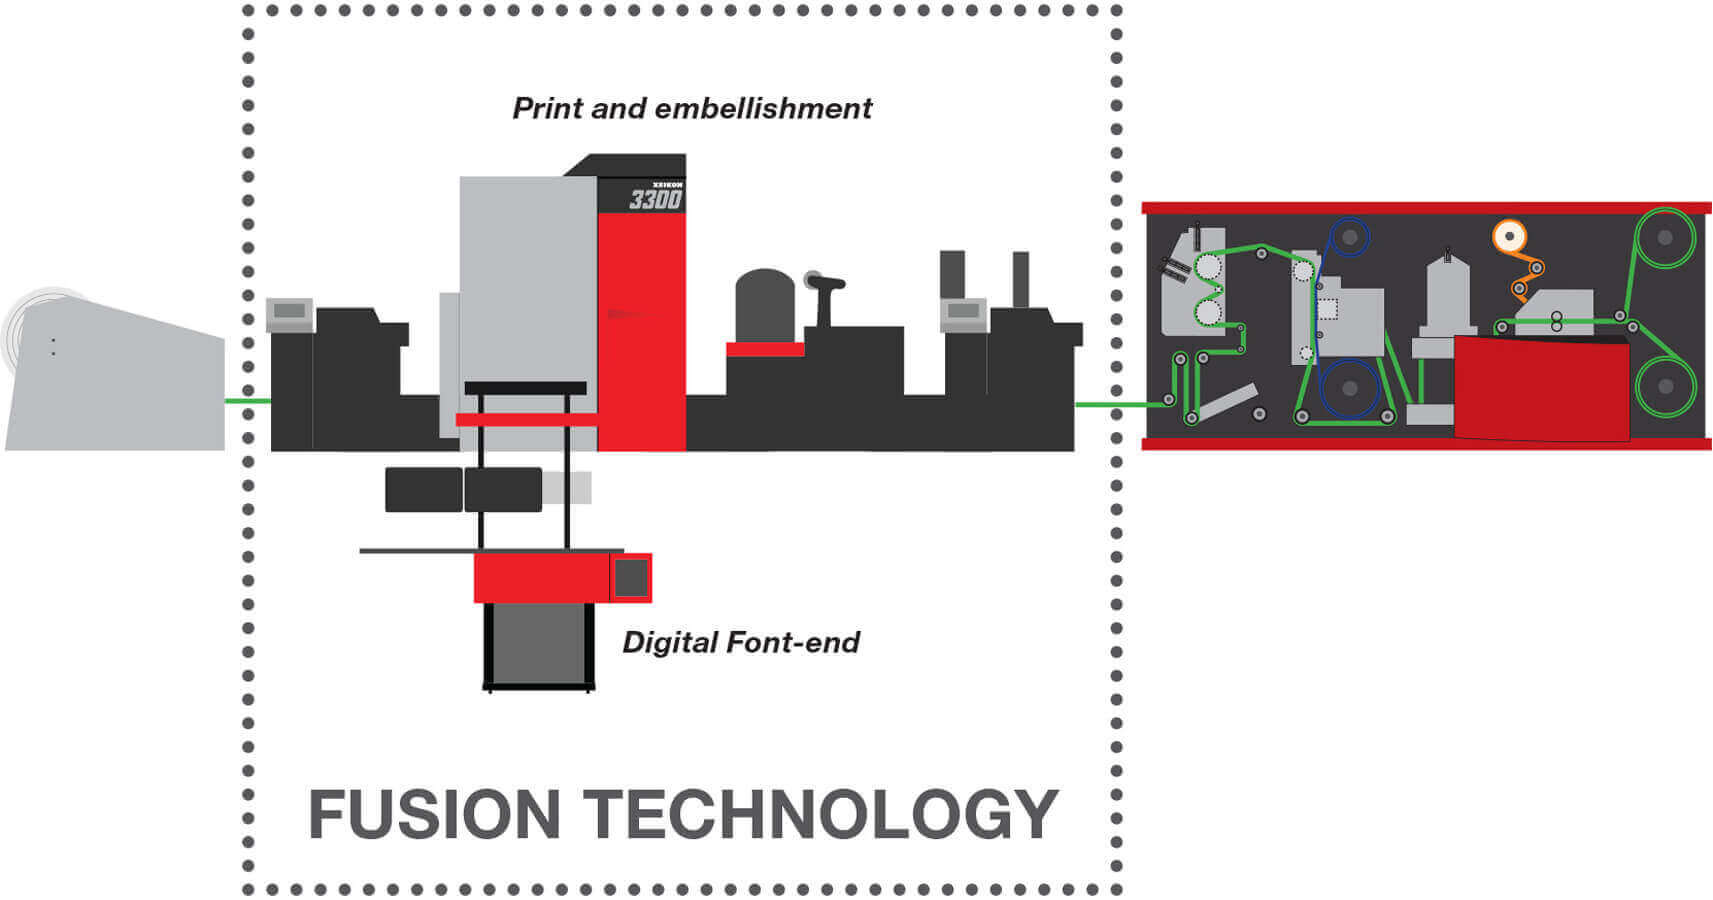 FusionTechnology